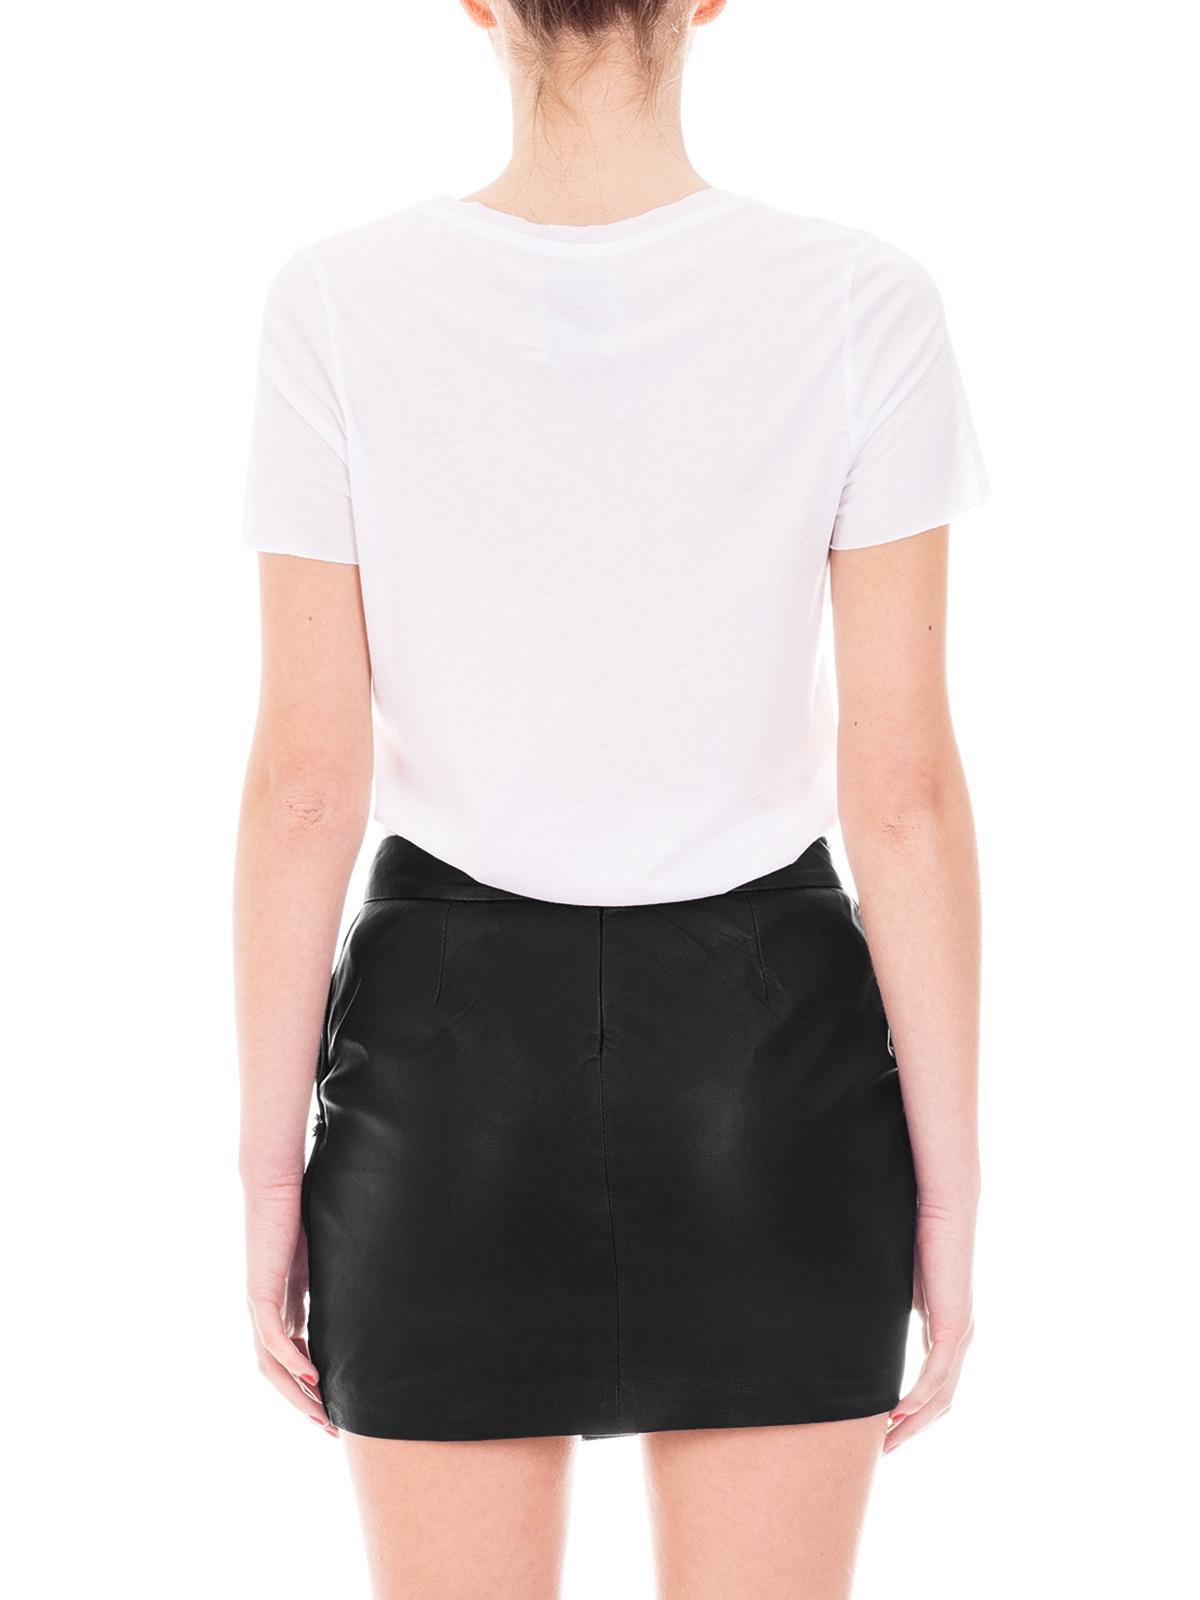 Maison Scotch | Black Leather Mini Envelope Skirt | GIRISSIMA.COM